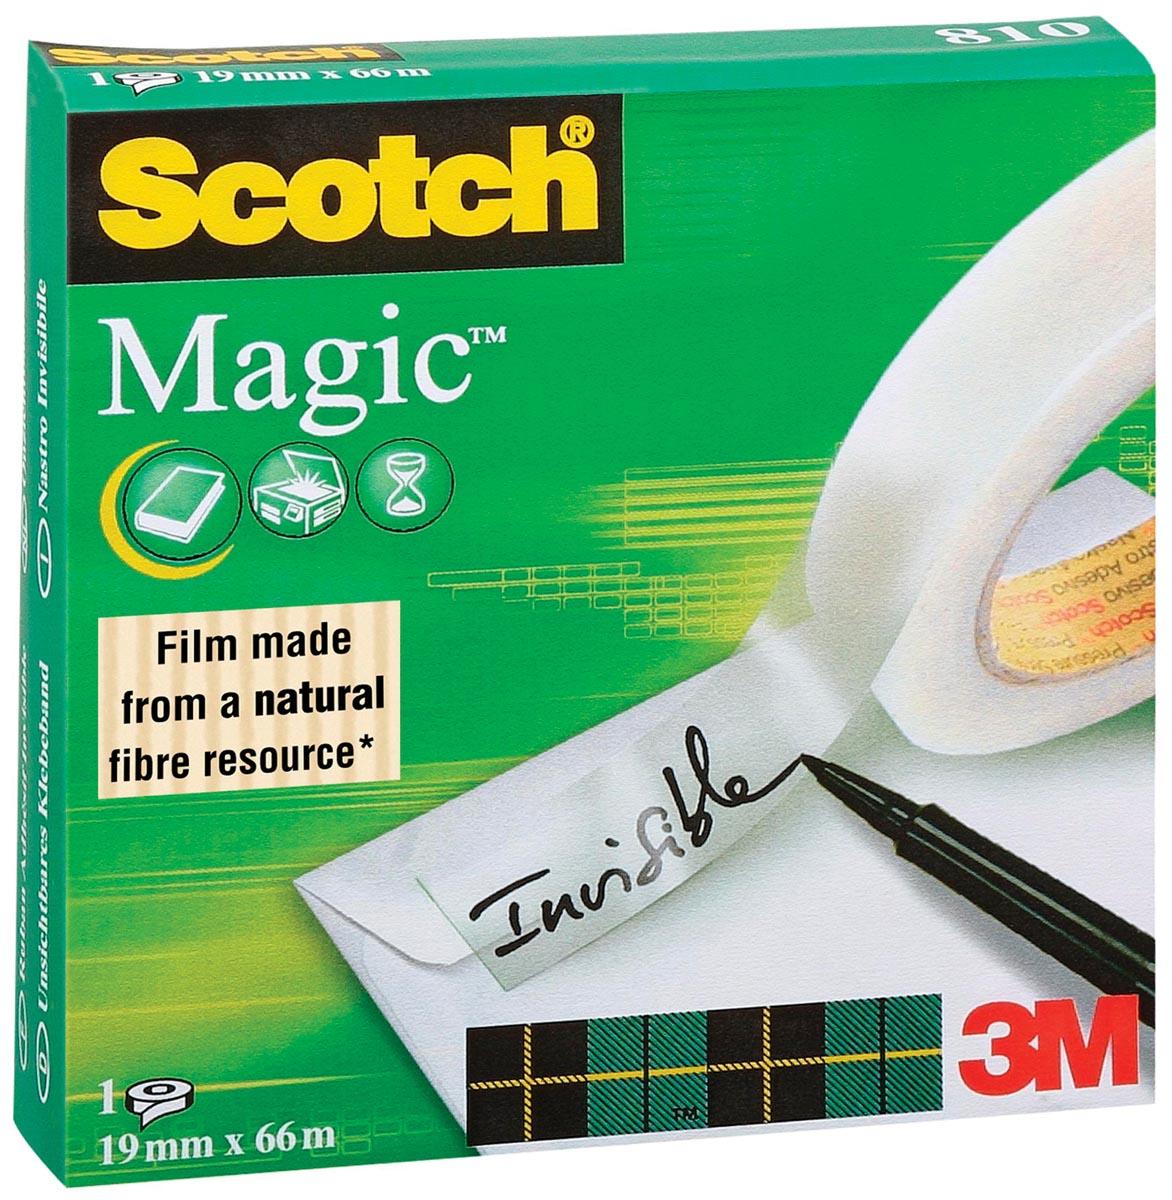 Scotch plakband Magic Tape ft 19 mm x 66 m